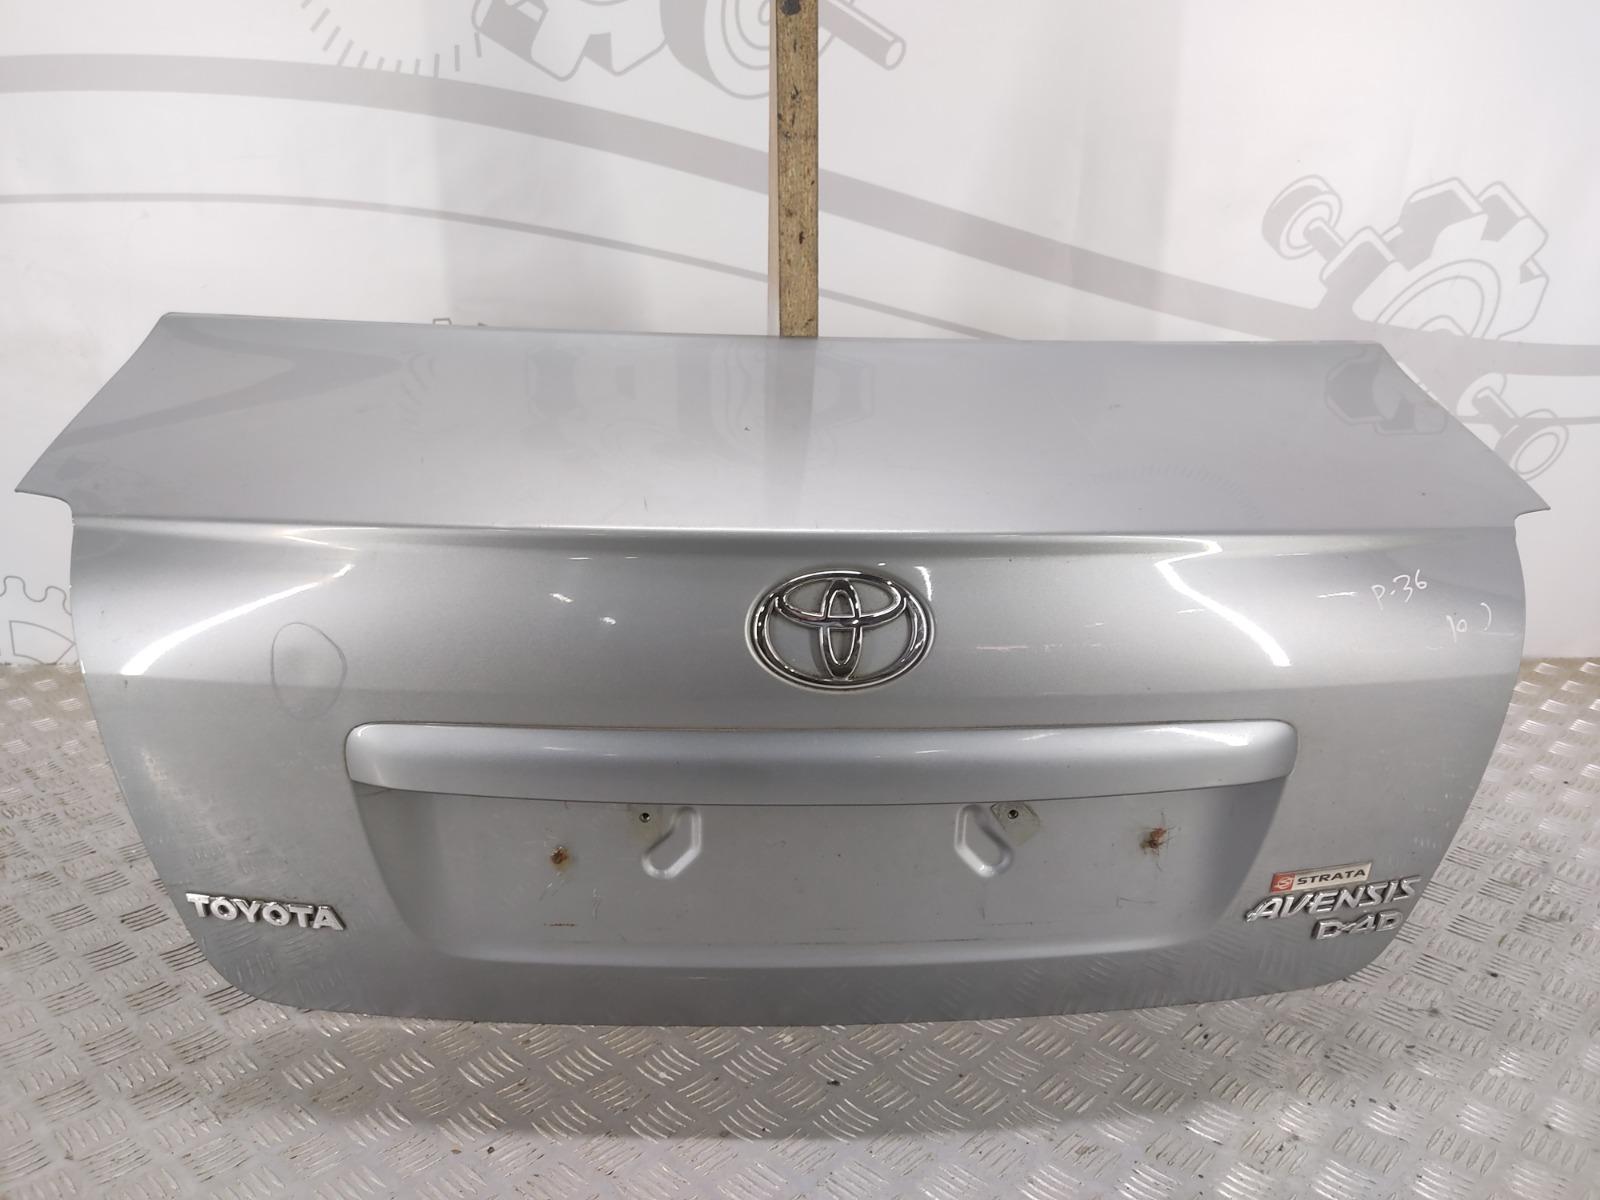 Крышка багажника (дверь 3-5) Toyota Avensis 2.0 D-4D 2009 (б/у)